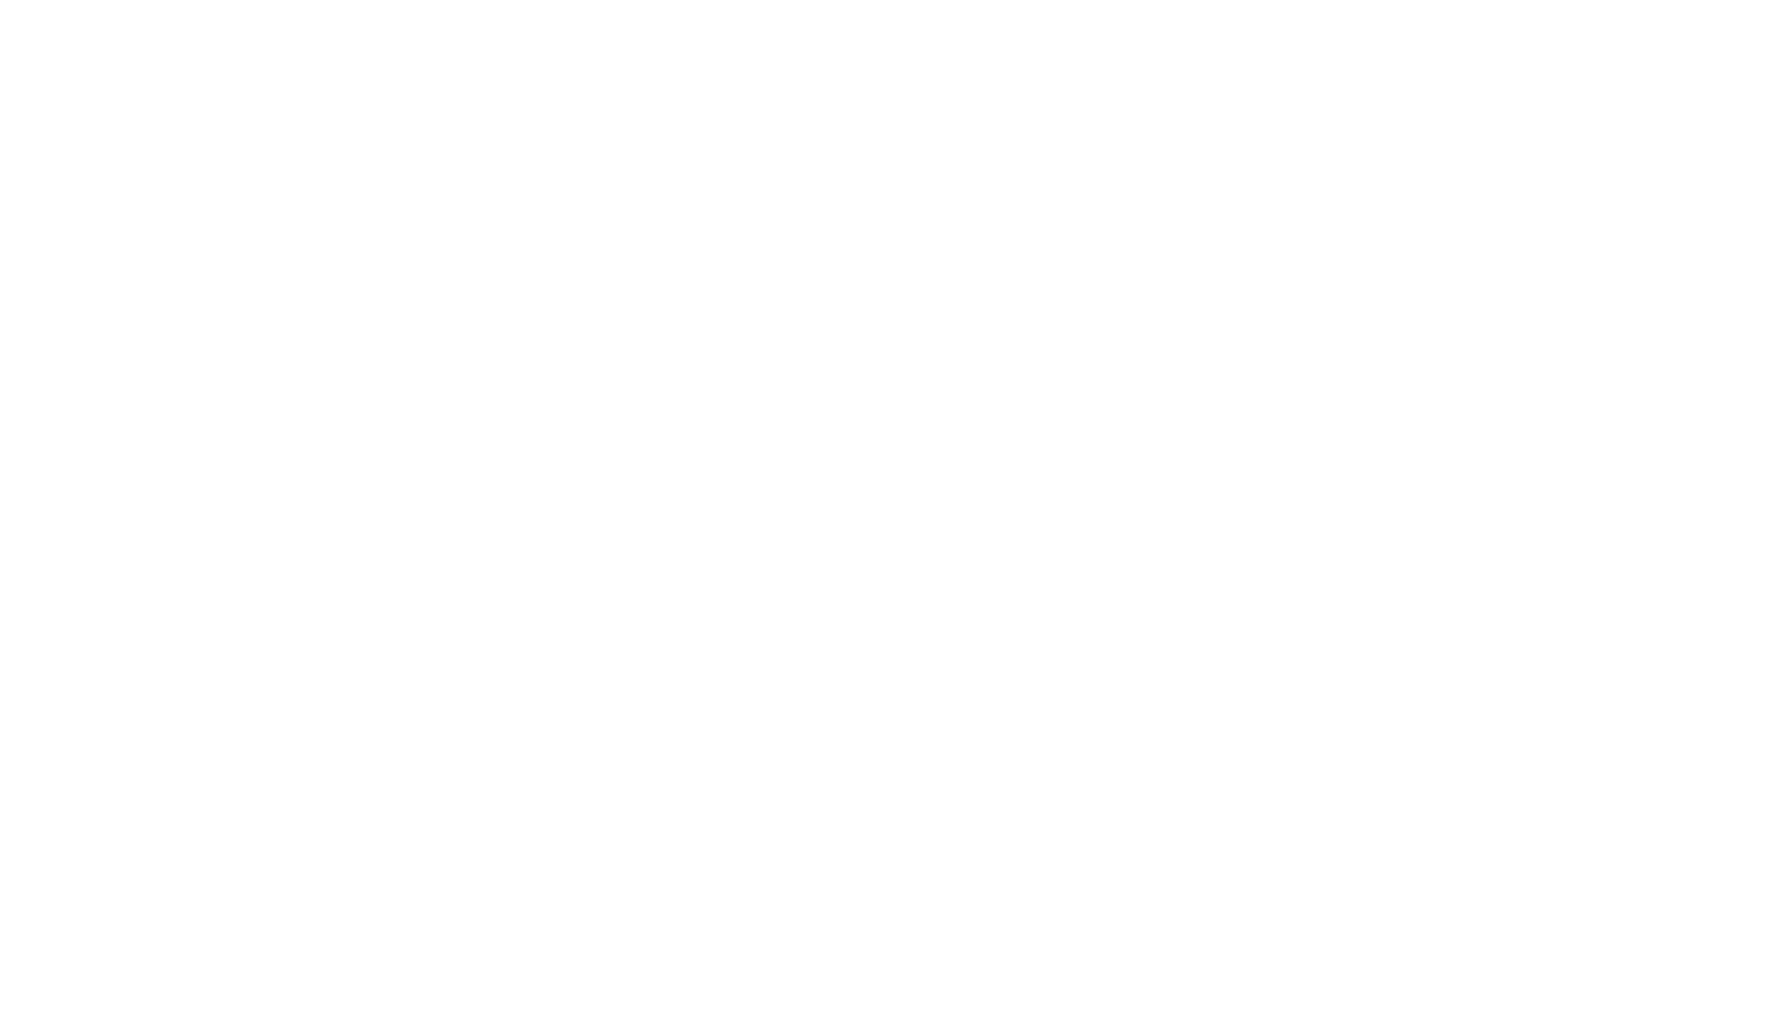 nito-logo-gronn-jpg.jpg